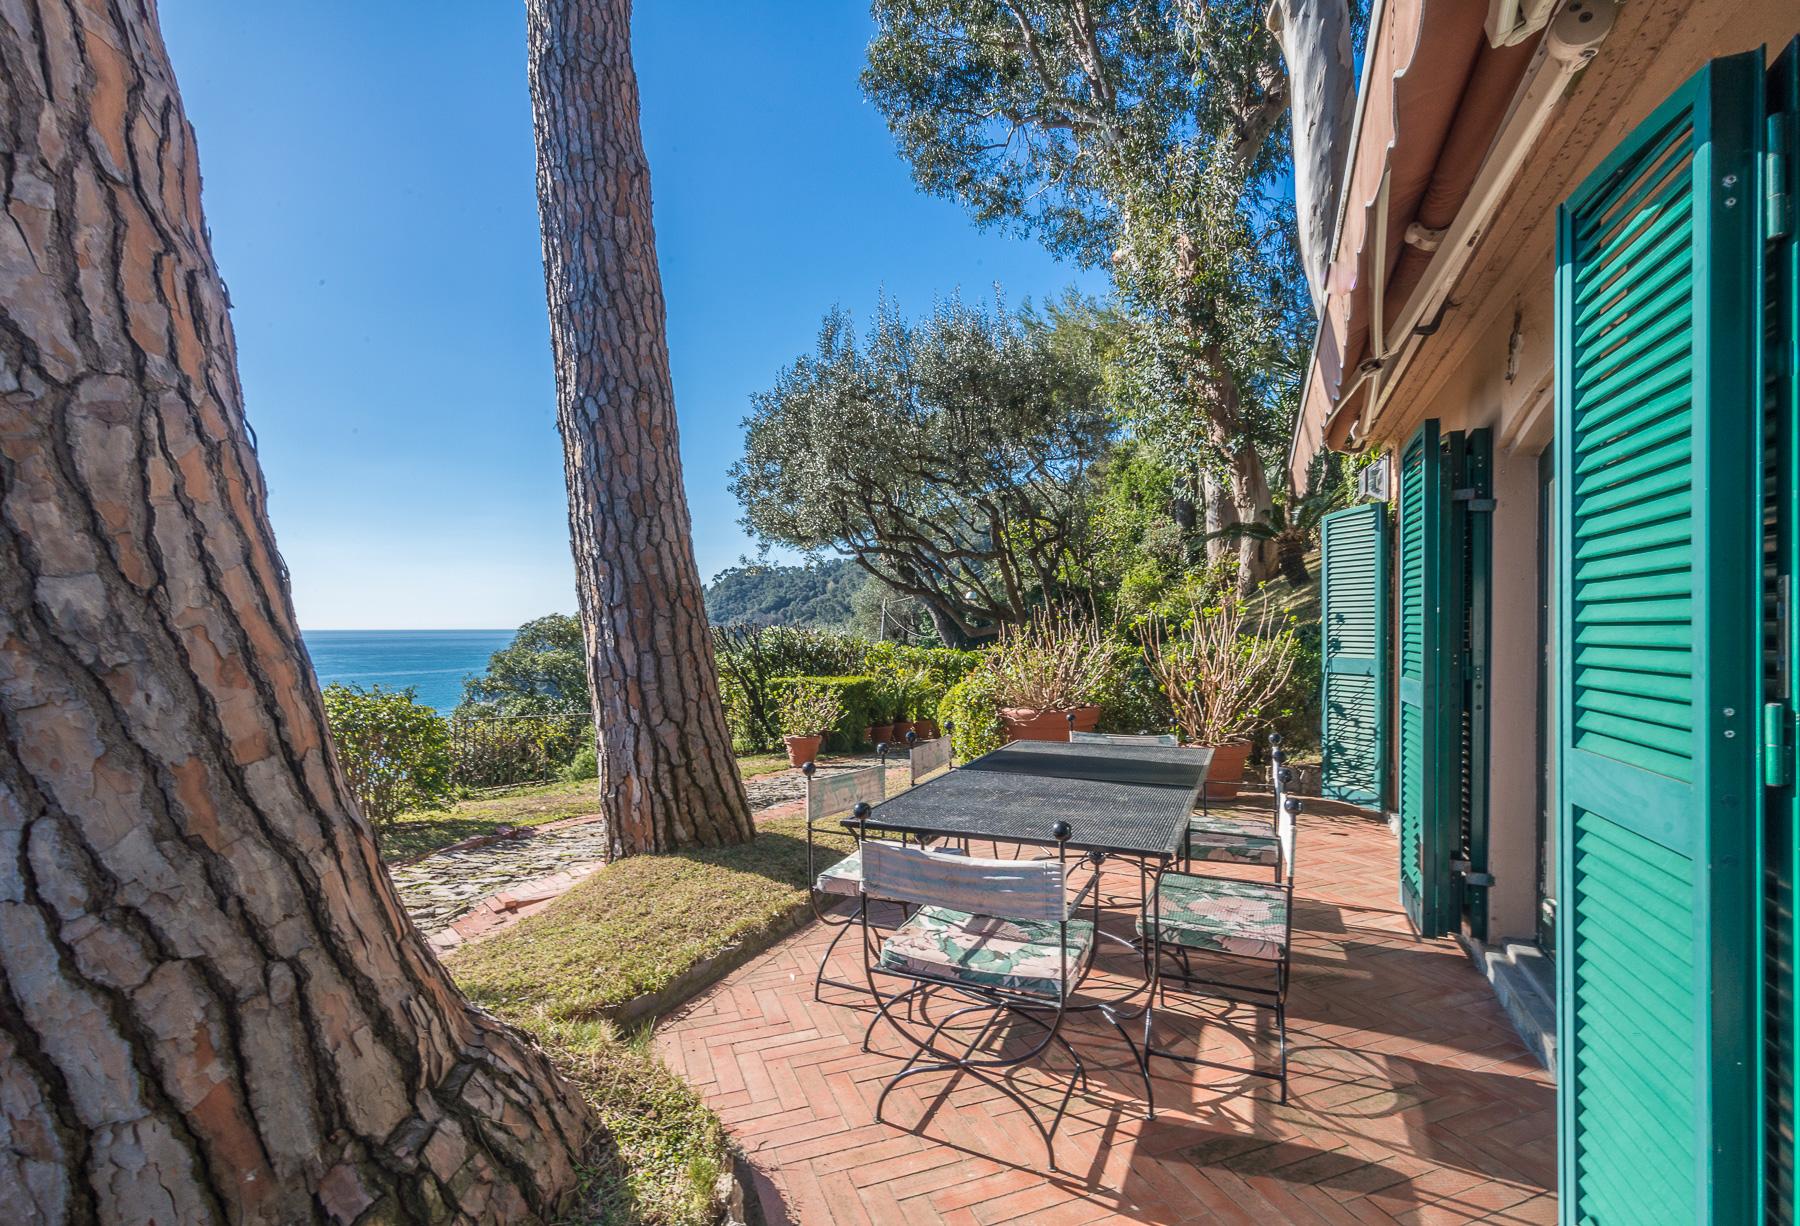 Villa in Vendita a Santa Margherita Ligure: 5 locali, 440 mq - Foto 23